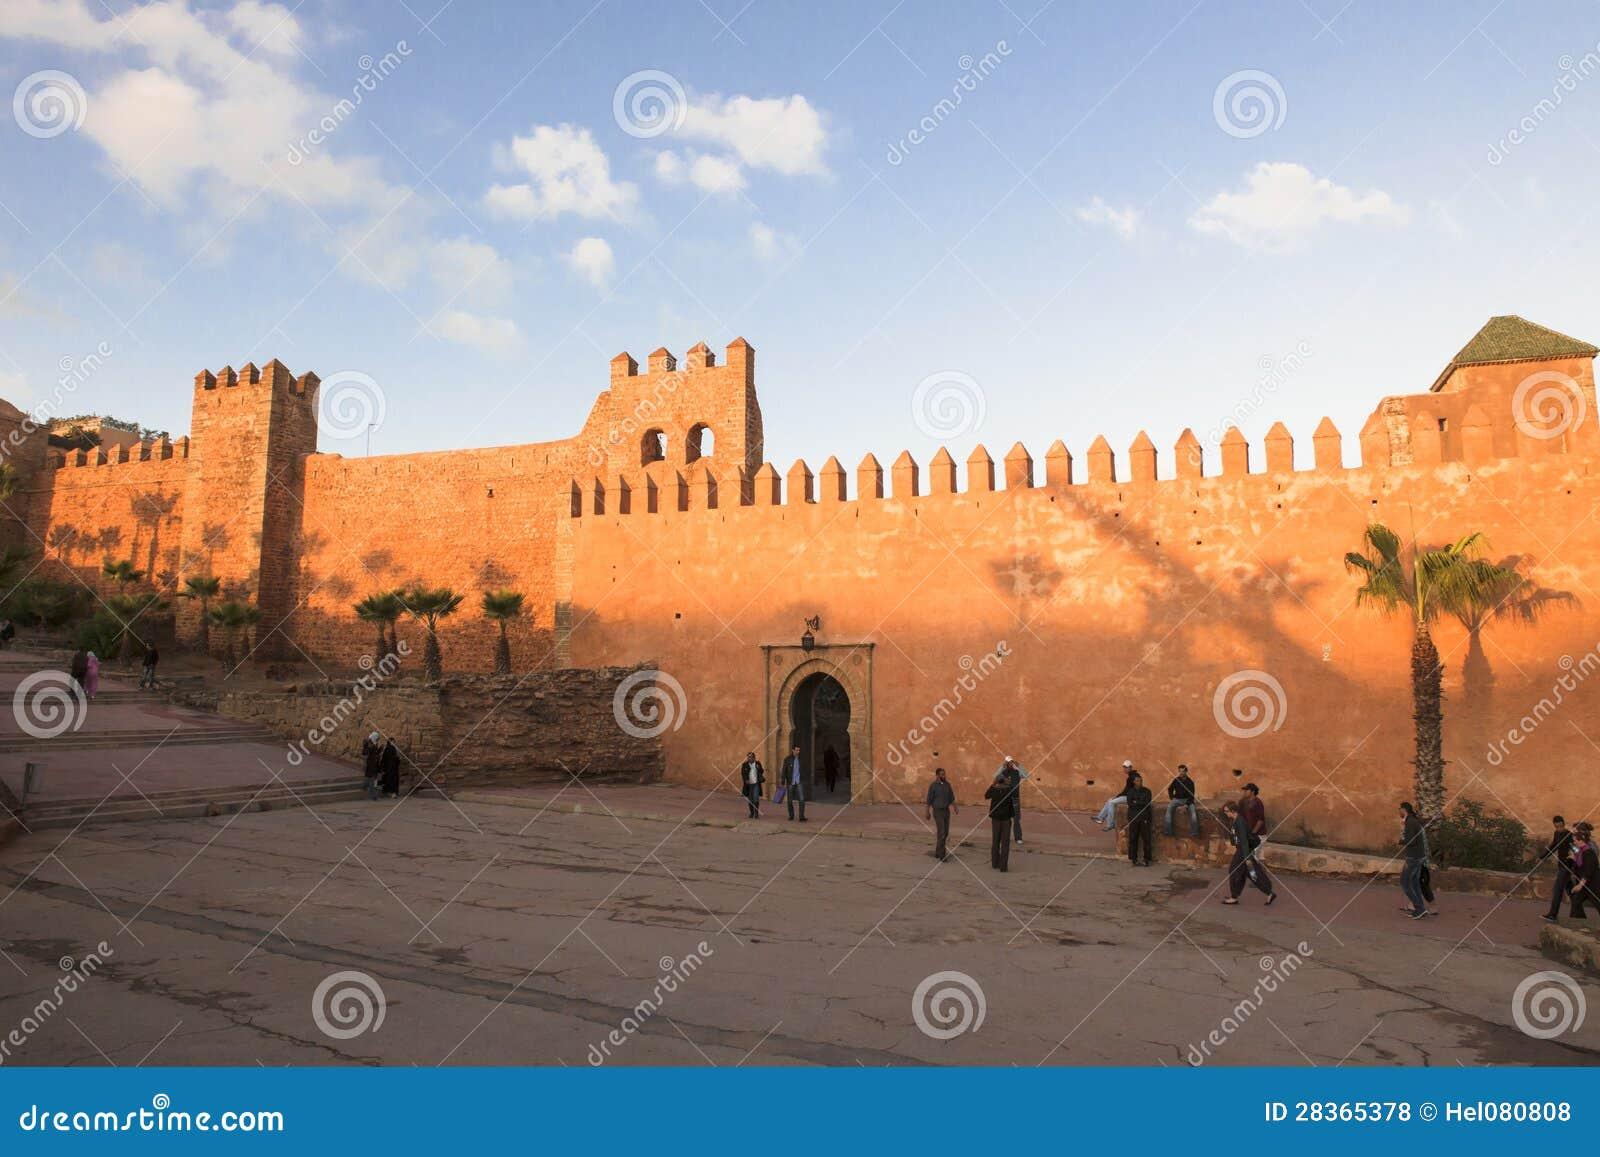 Mur à Rabat, Marocco